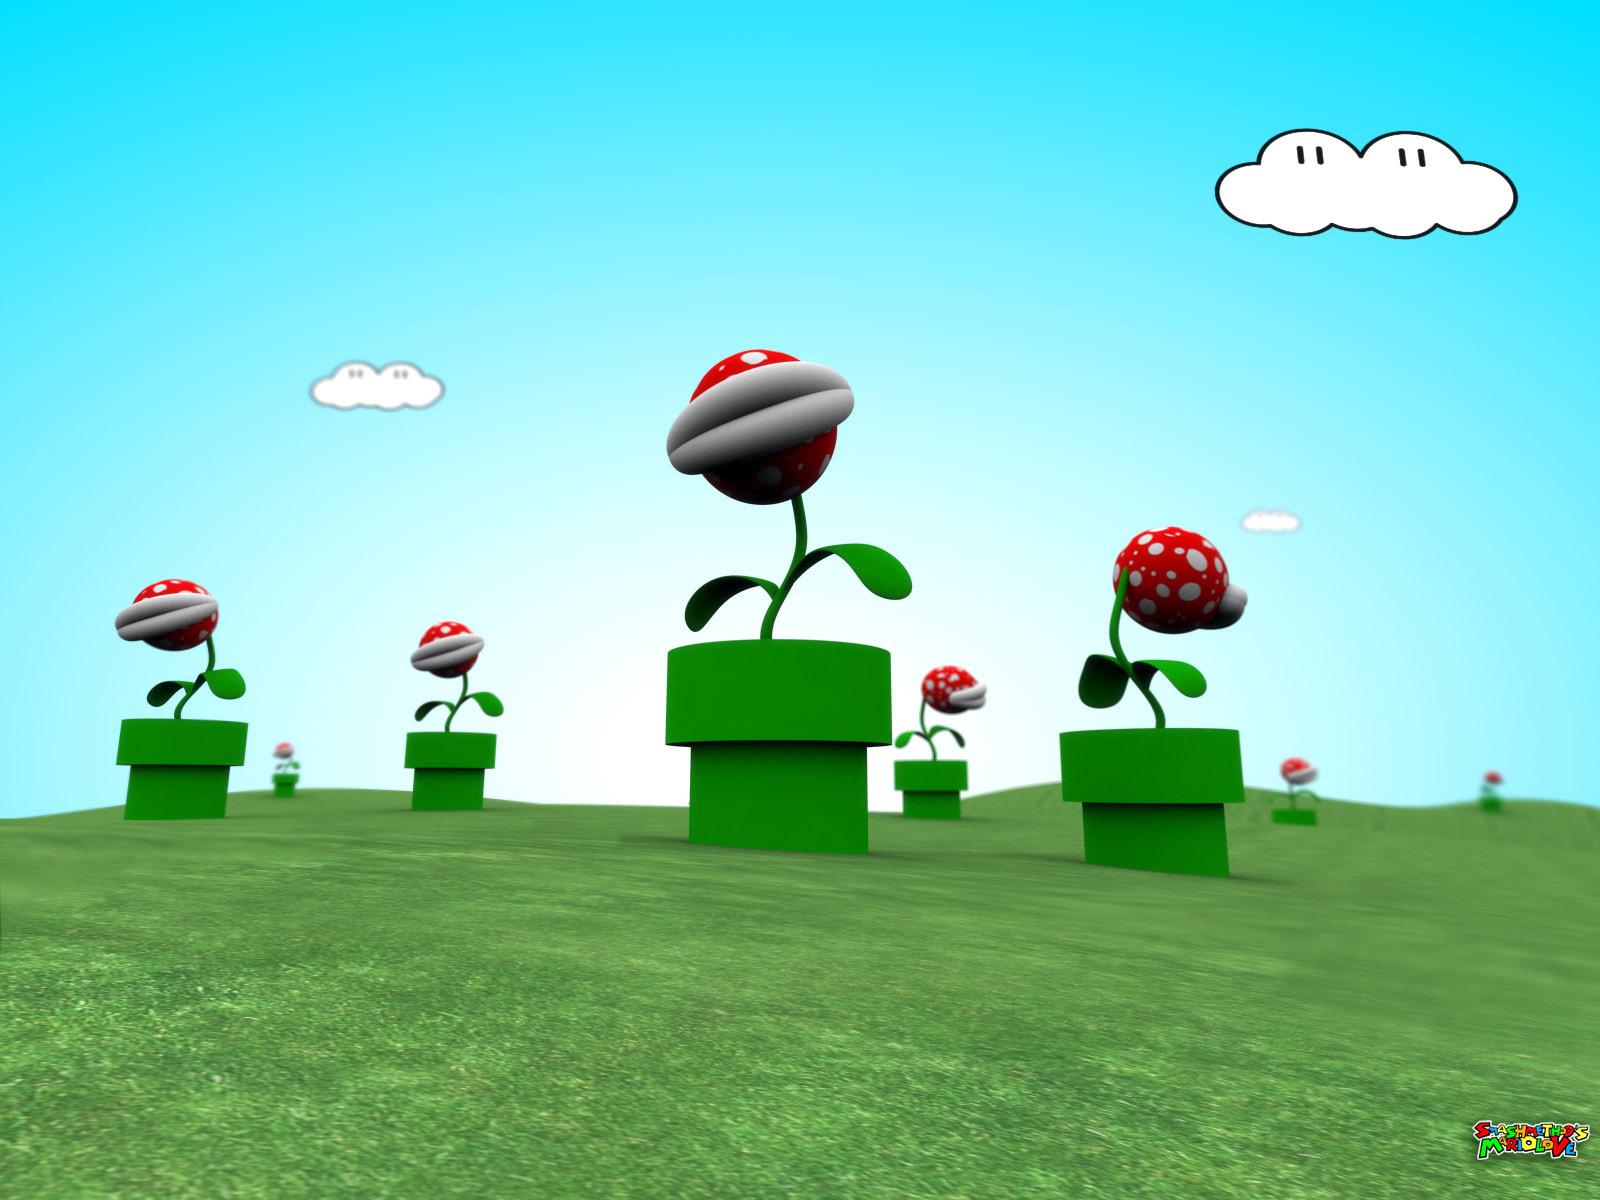 Super Mario achtergrond